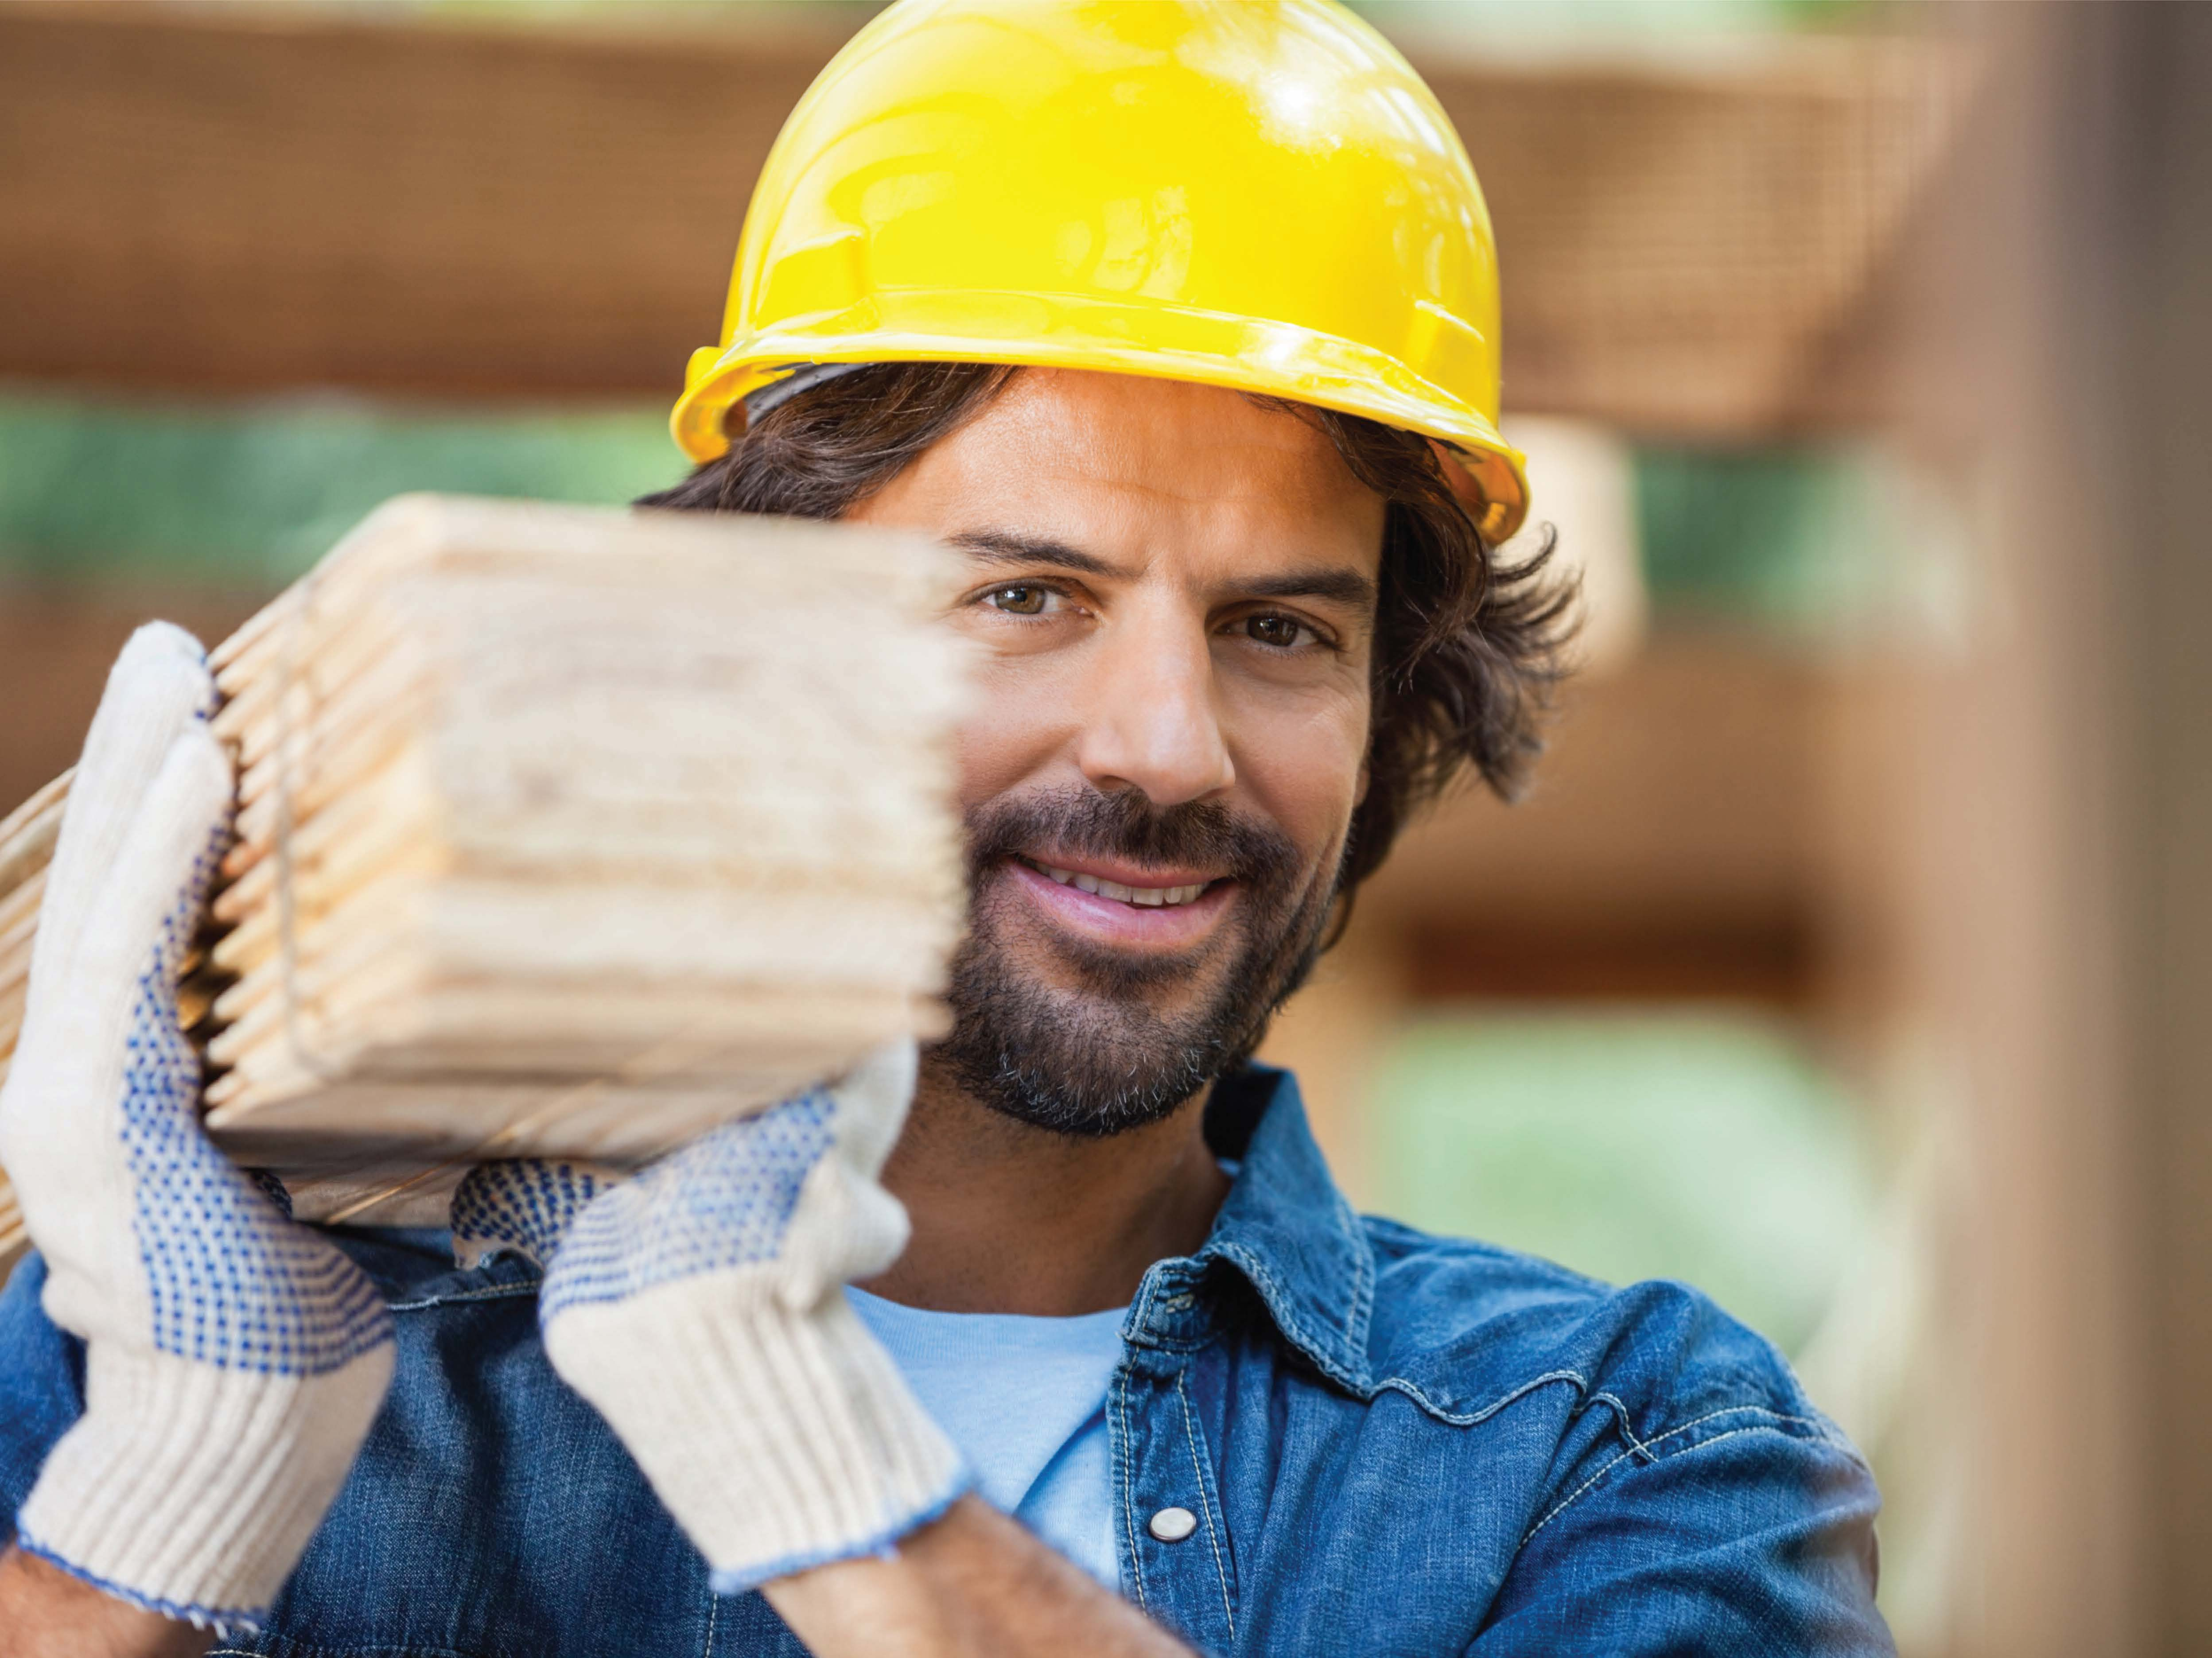 Build a home in Utah